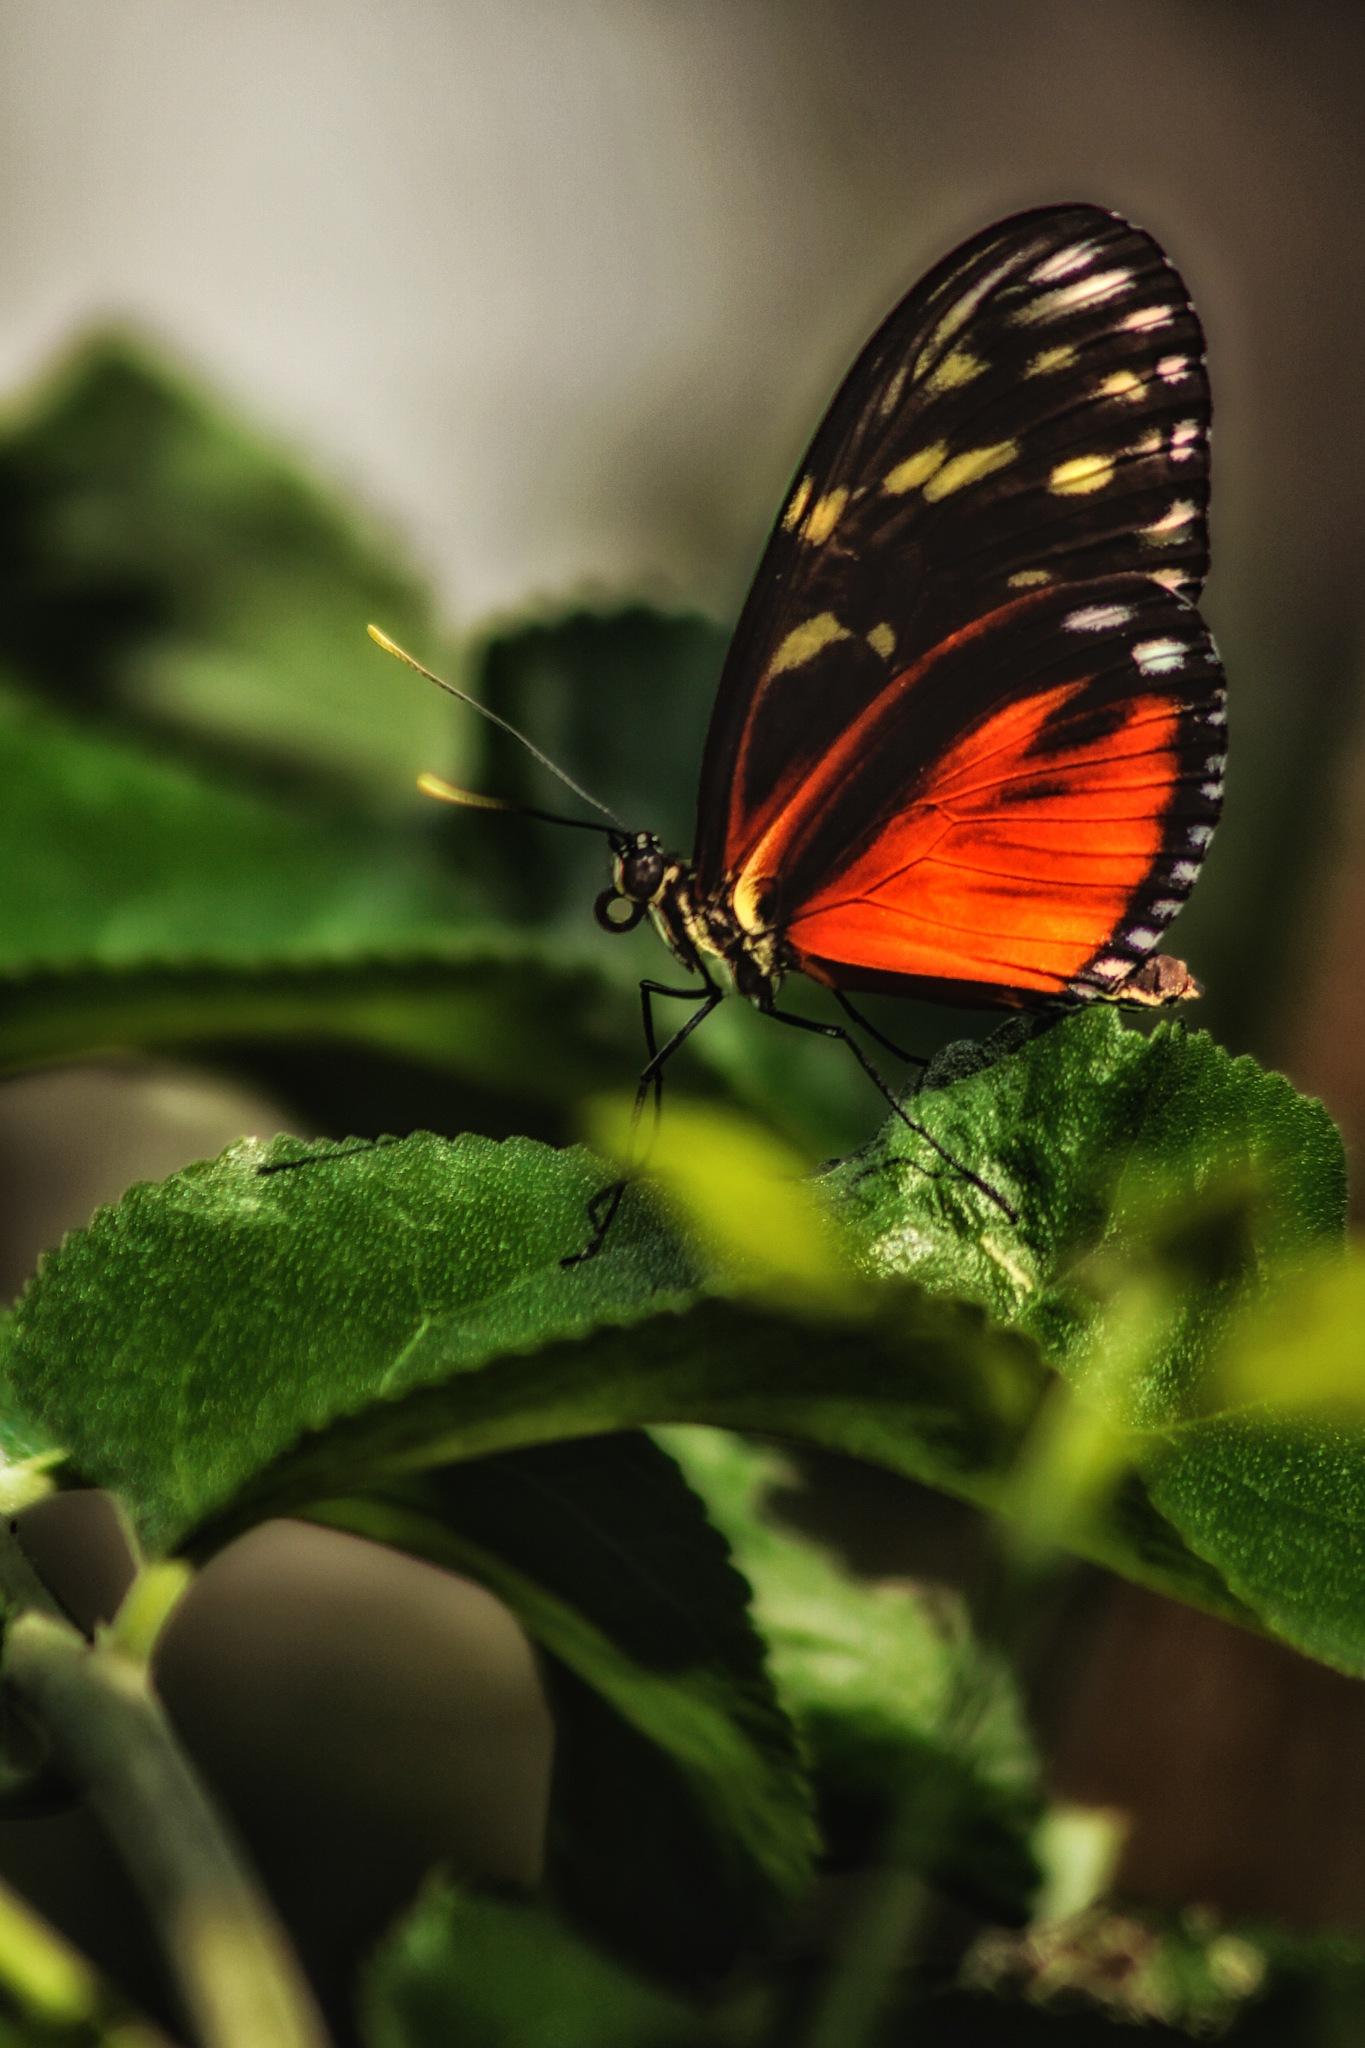 Butterfly by David Walters